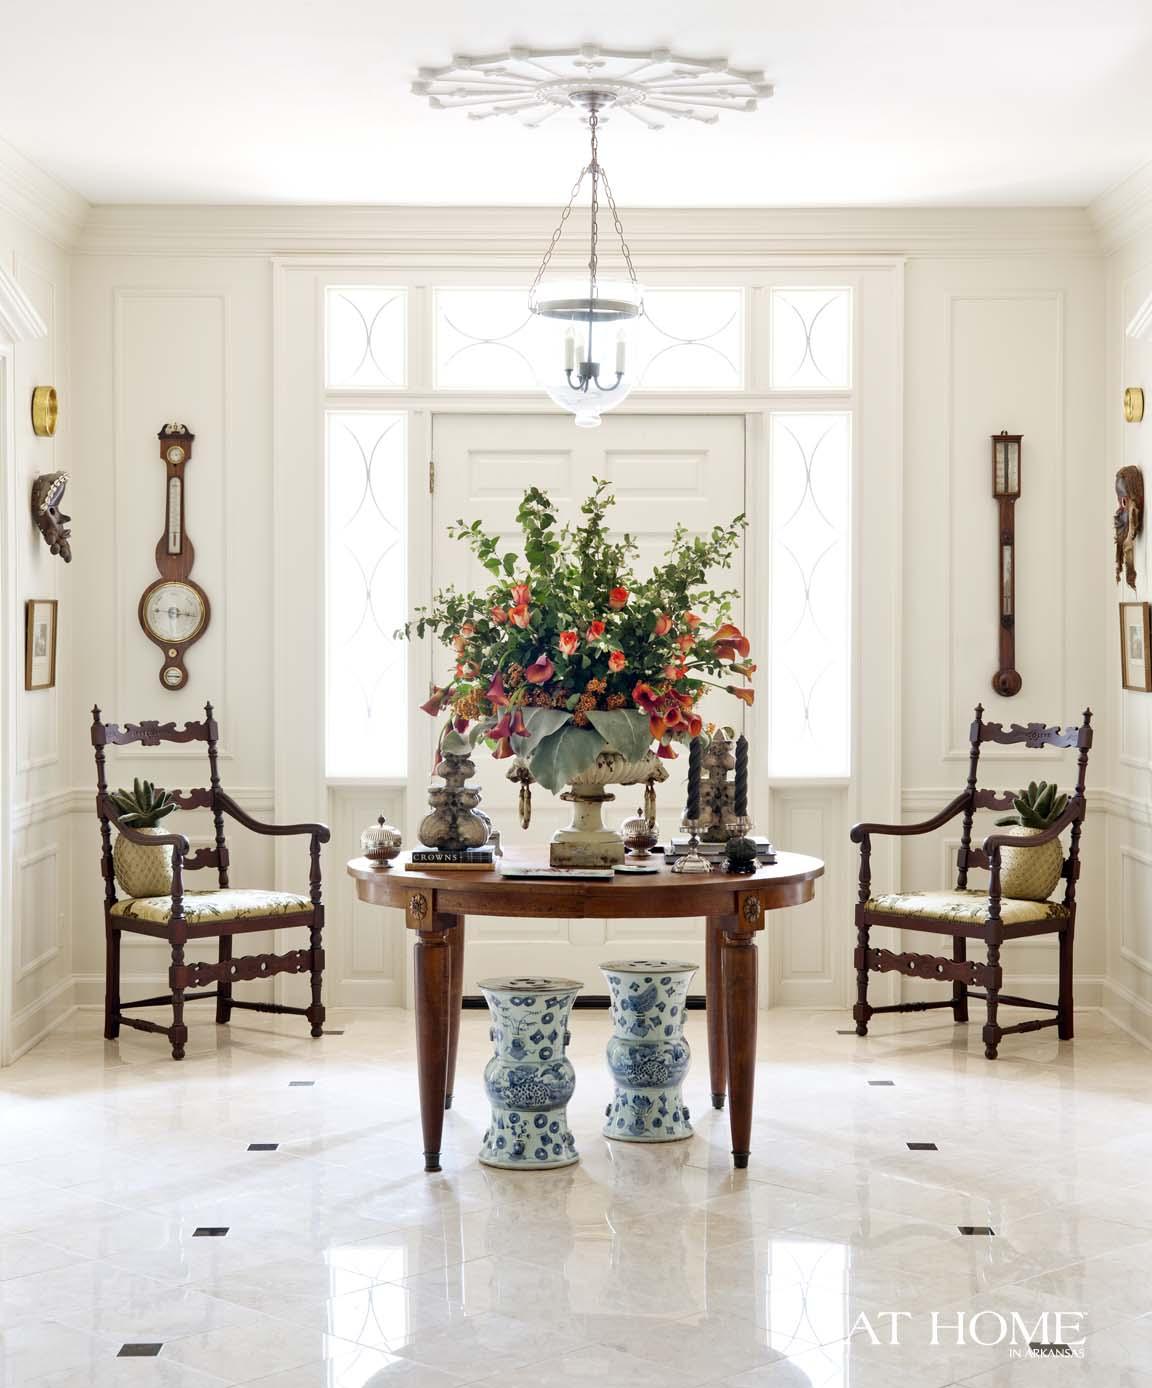 Ideas For Foyers foyers/entryways - homemajestic